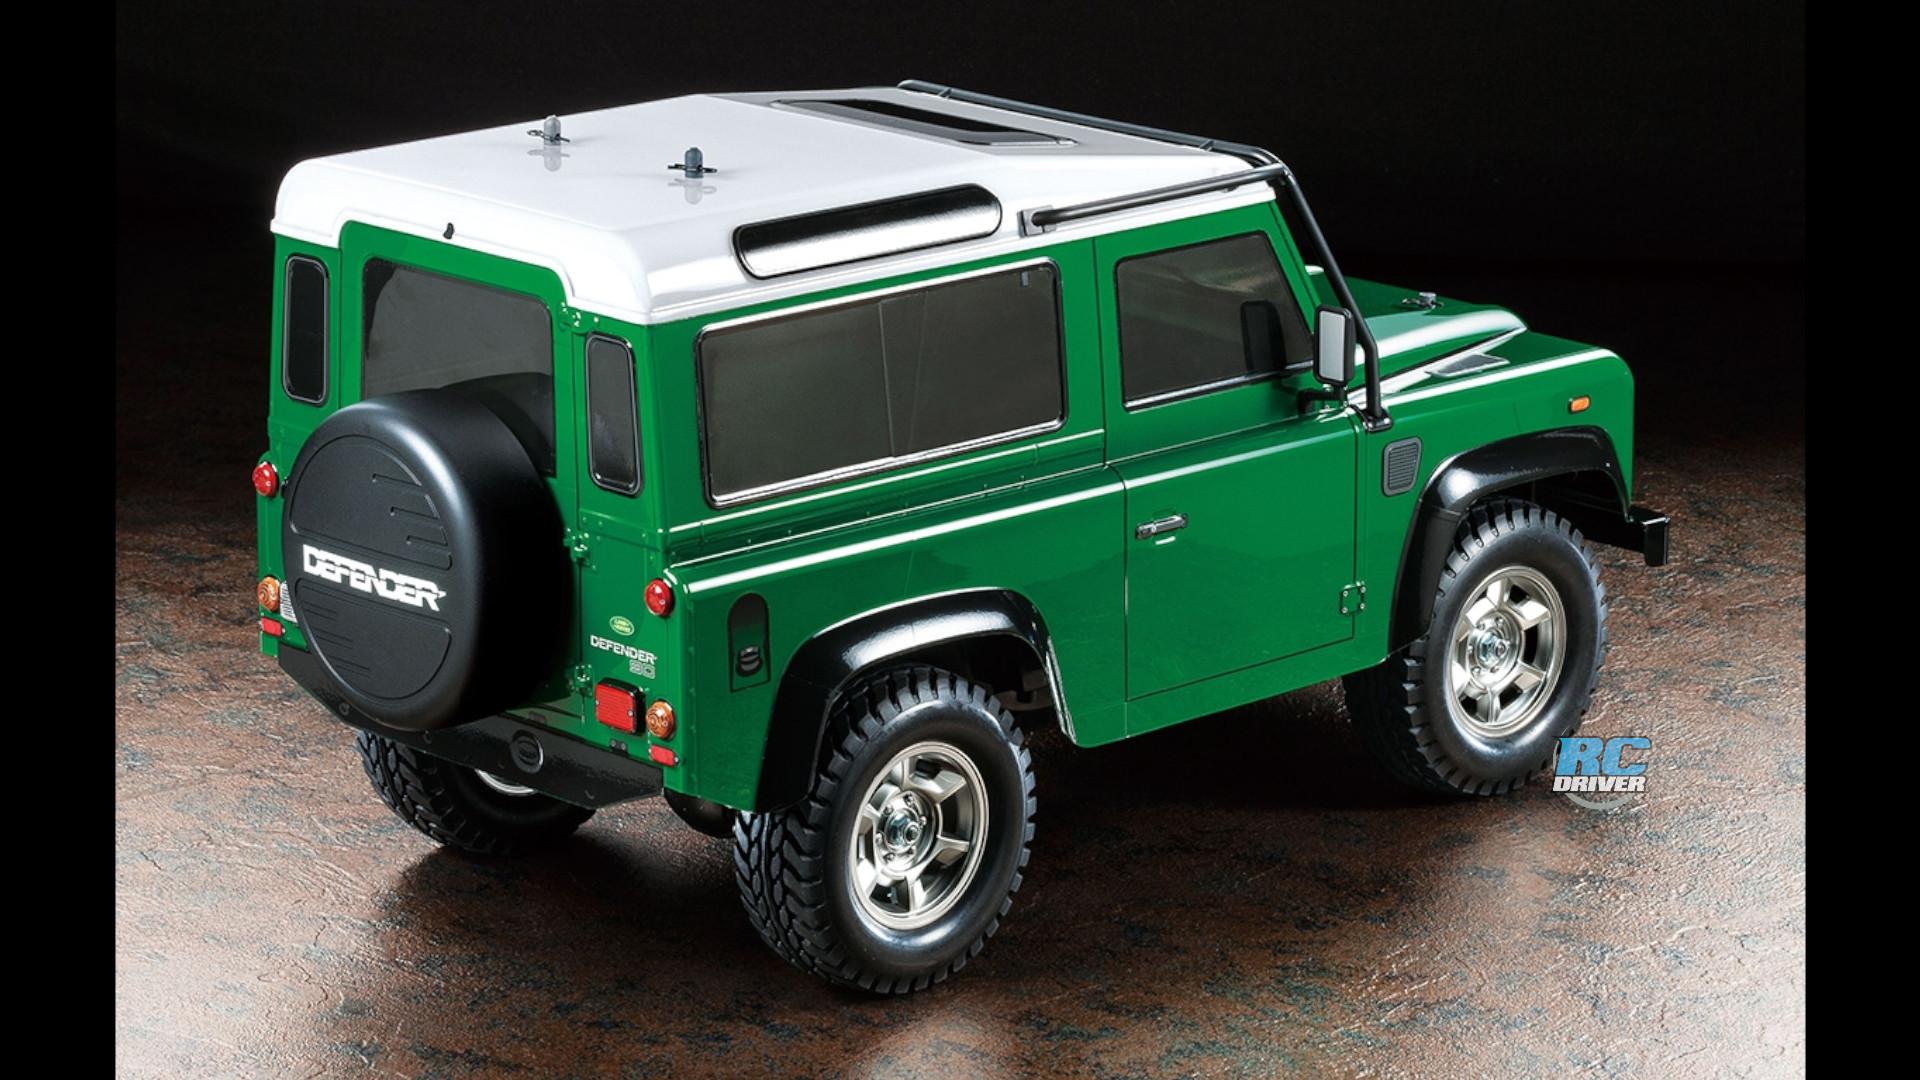 Tamiya Land Rover Defender 90—performance boosting option parts